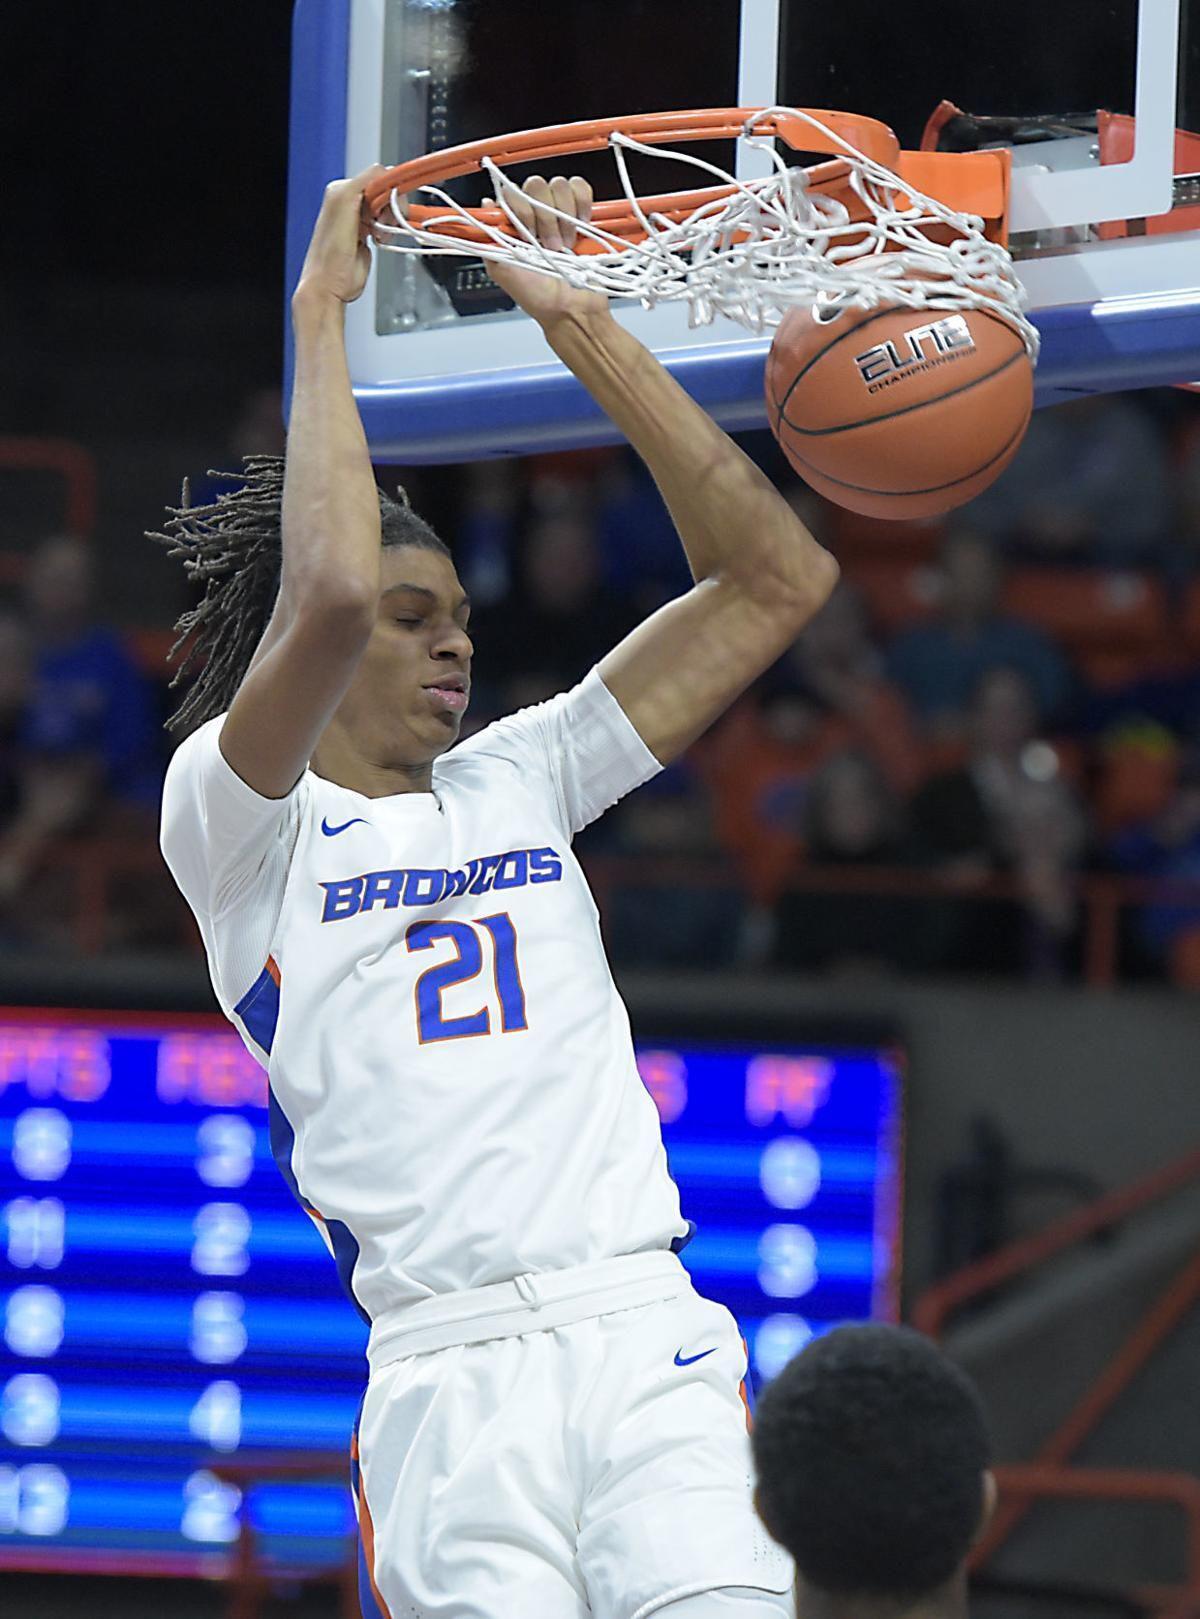 Boise State's Derrick Alston Jr. declares for the draft